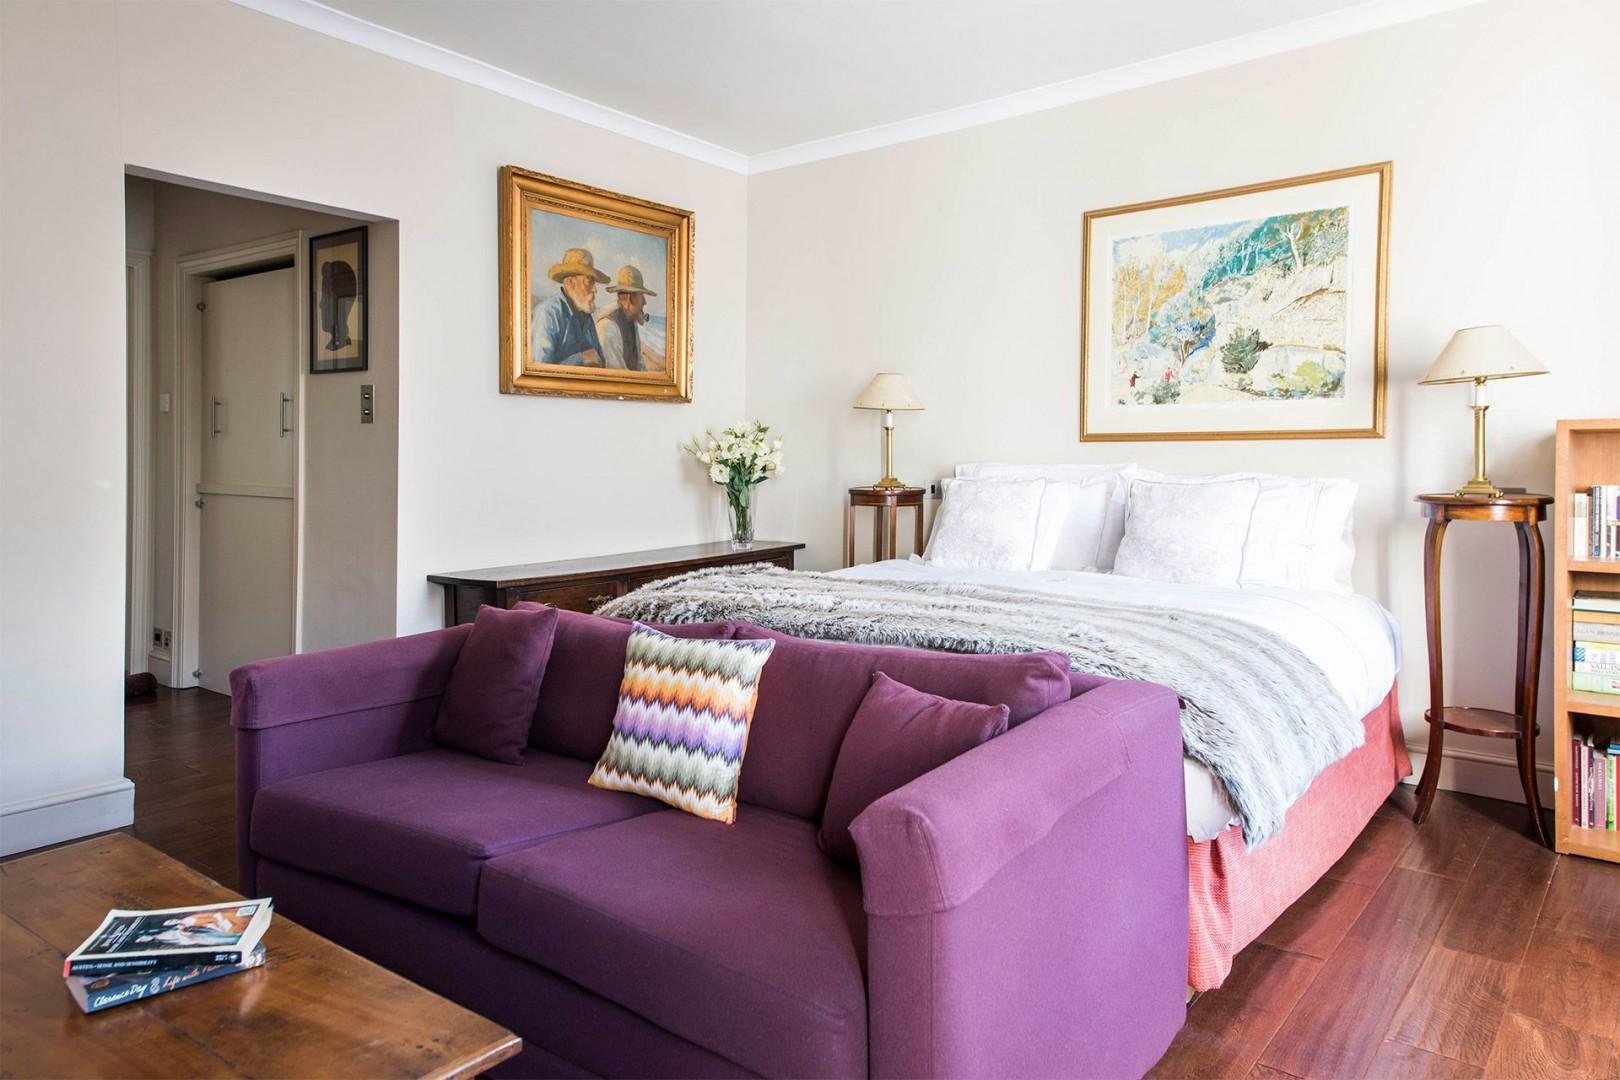 Sofa converts into a comfortable bed at night